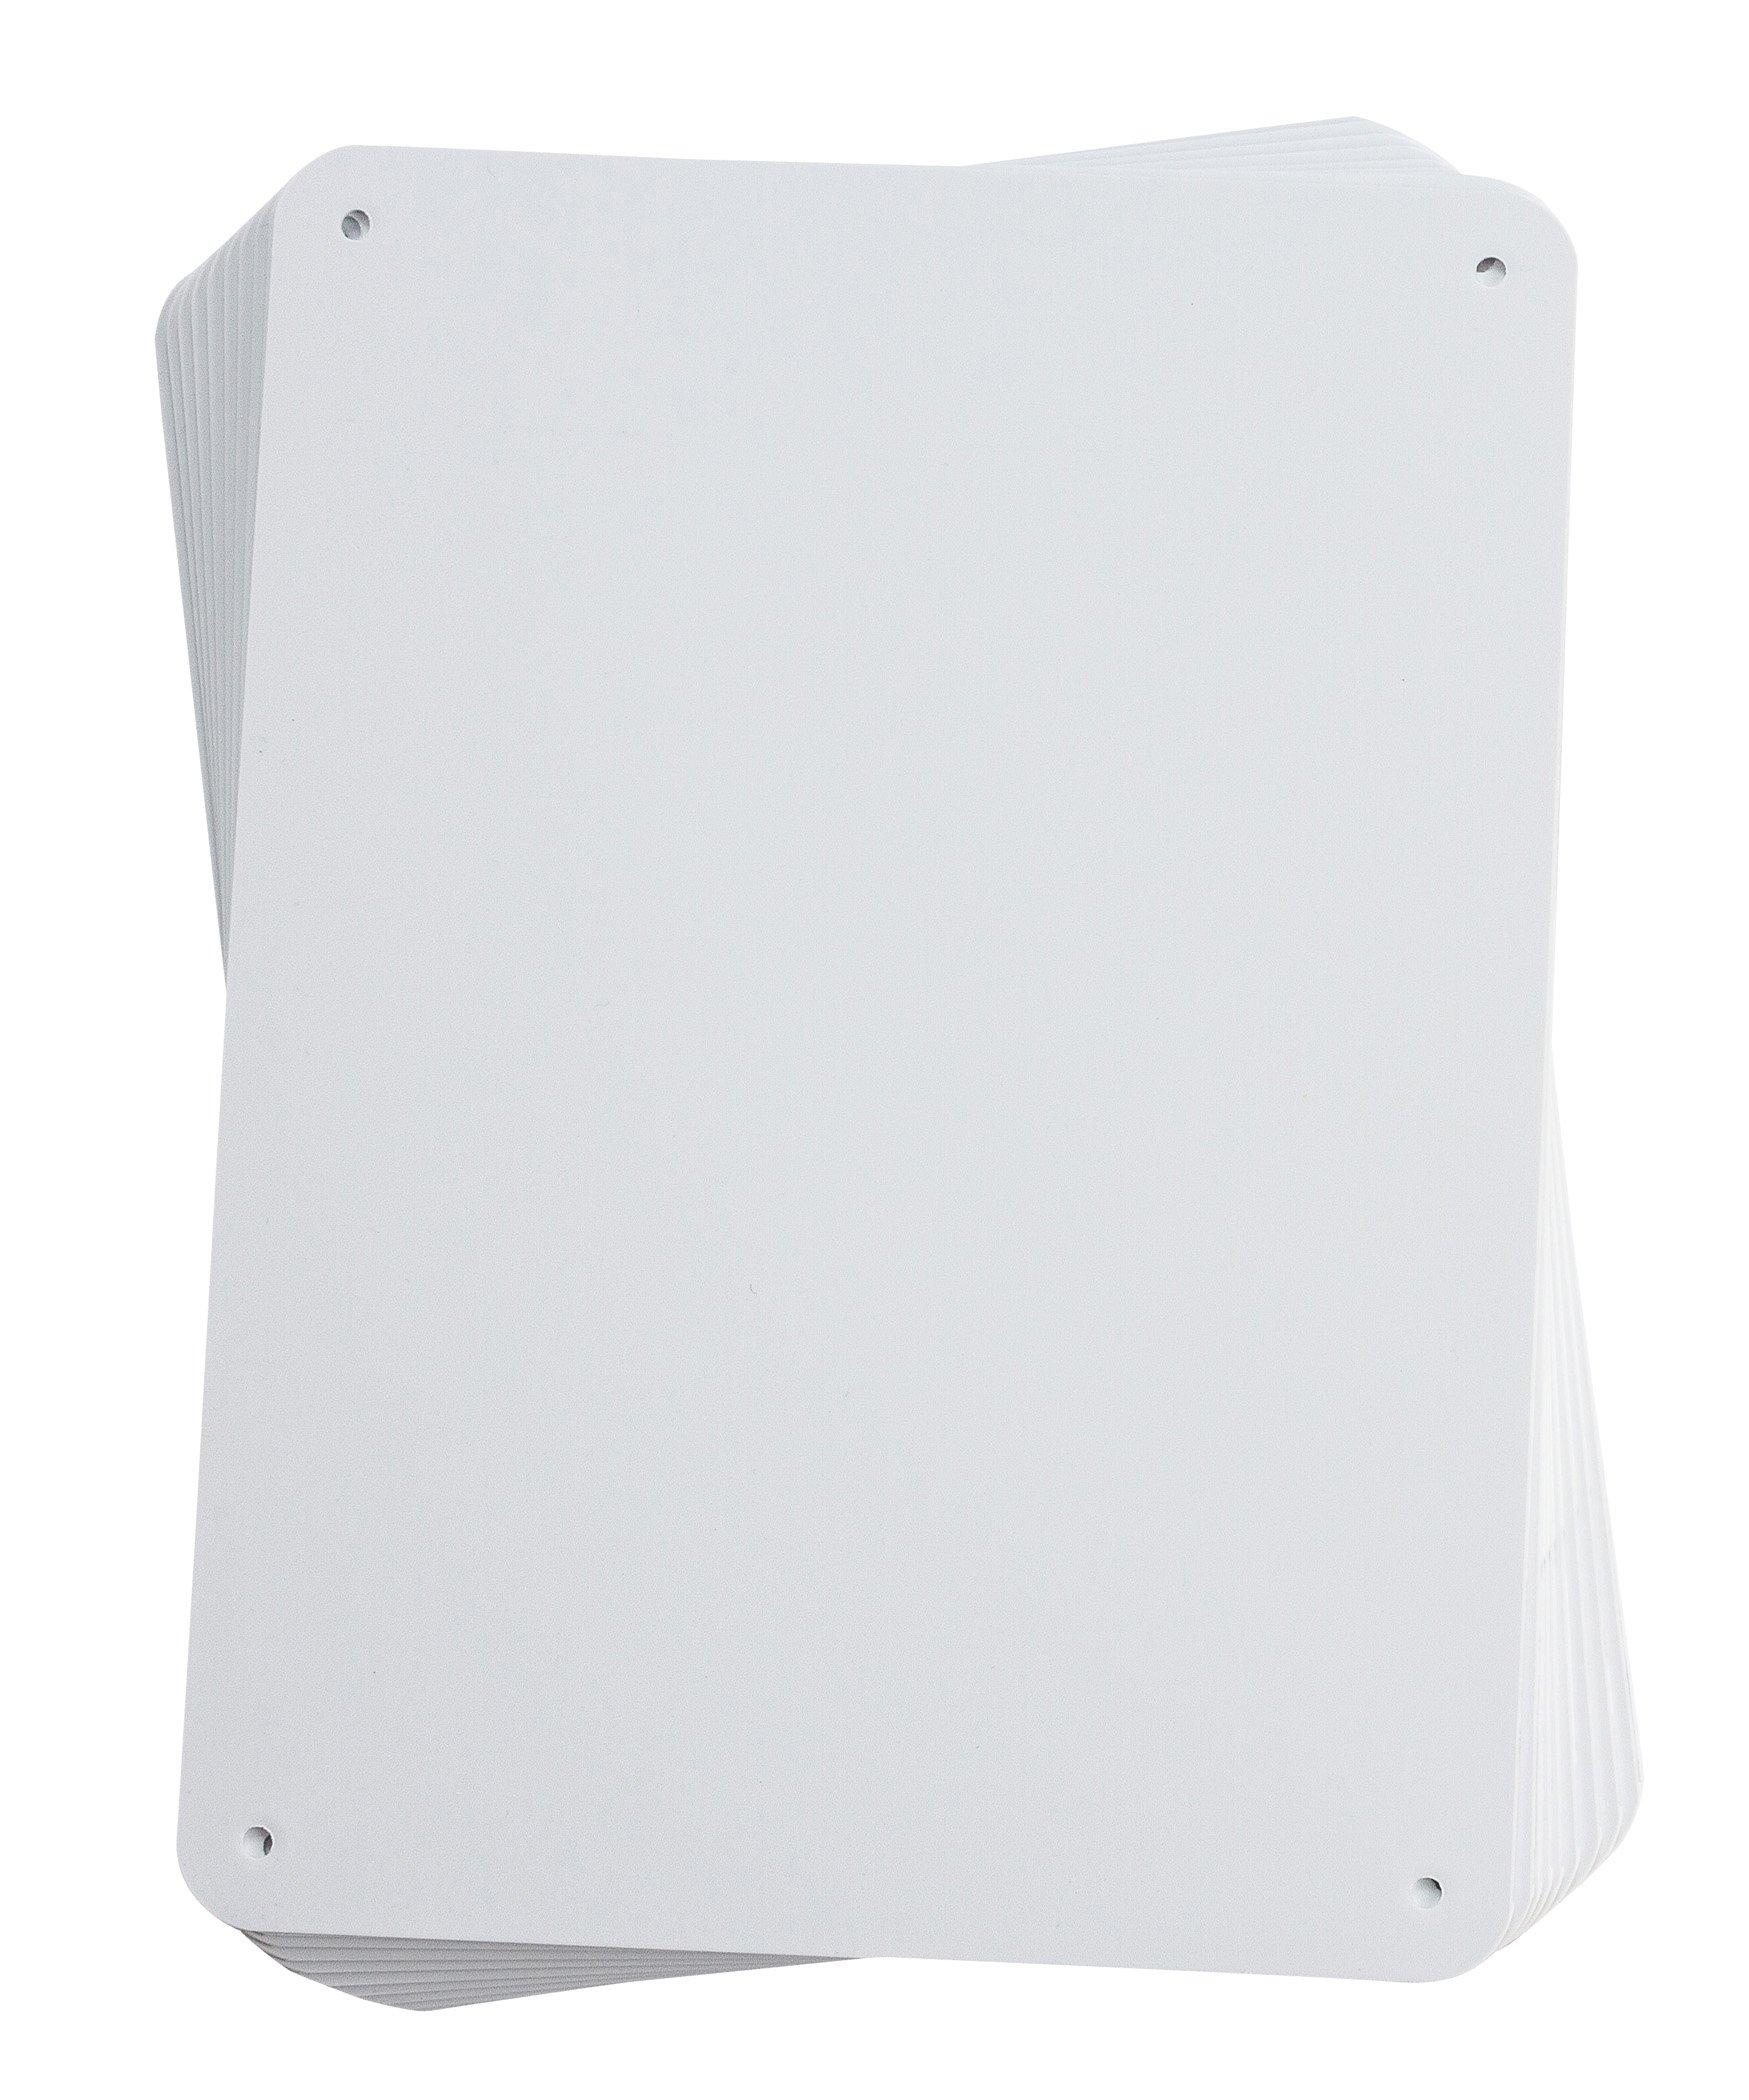 Brady 106460 Sign Blanks, Aluminum, 7.63'' x 10.38'' 7.63'' x 10.38''